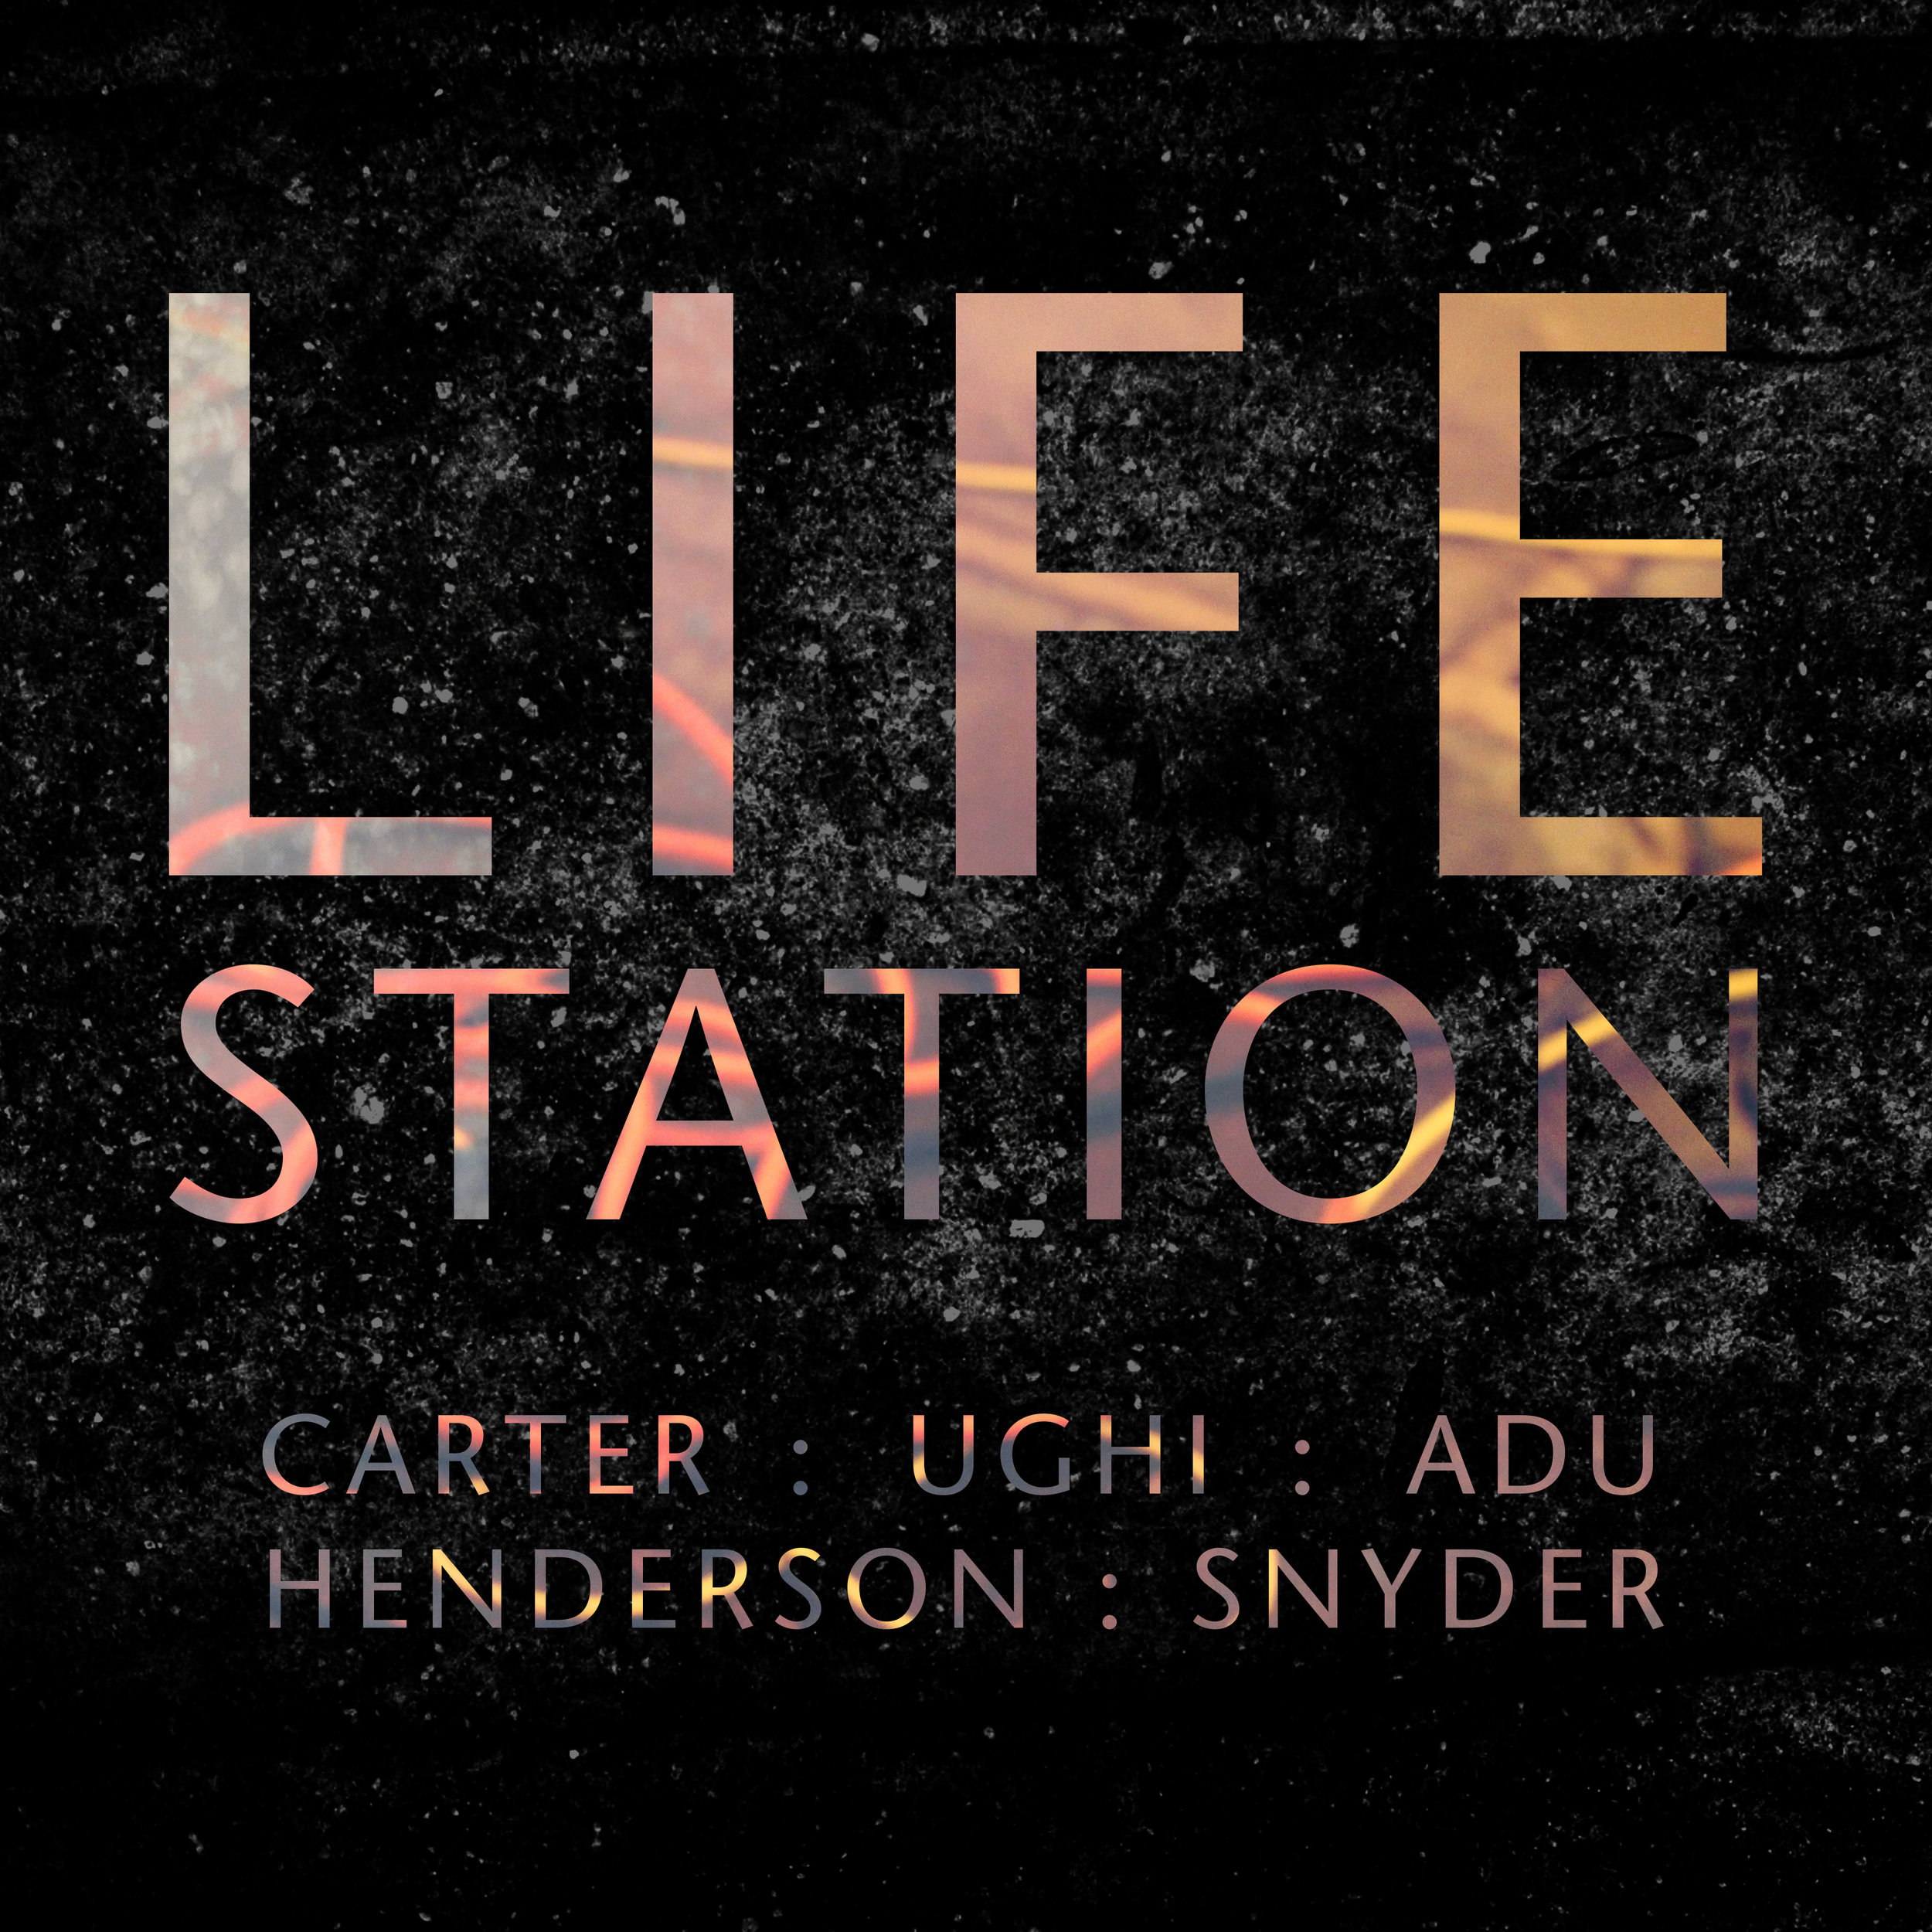 LEILA ADU, DANIEL CARTER, JEFF HENDERSON, JEFF SNYDER, FEDERICO UGHI :: LIFE STATION